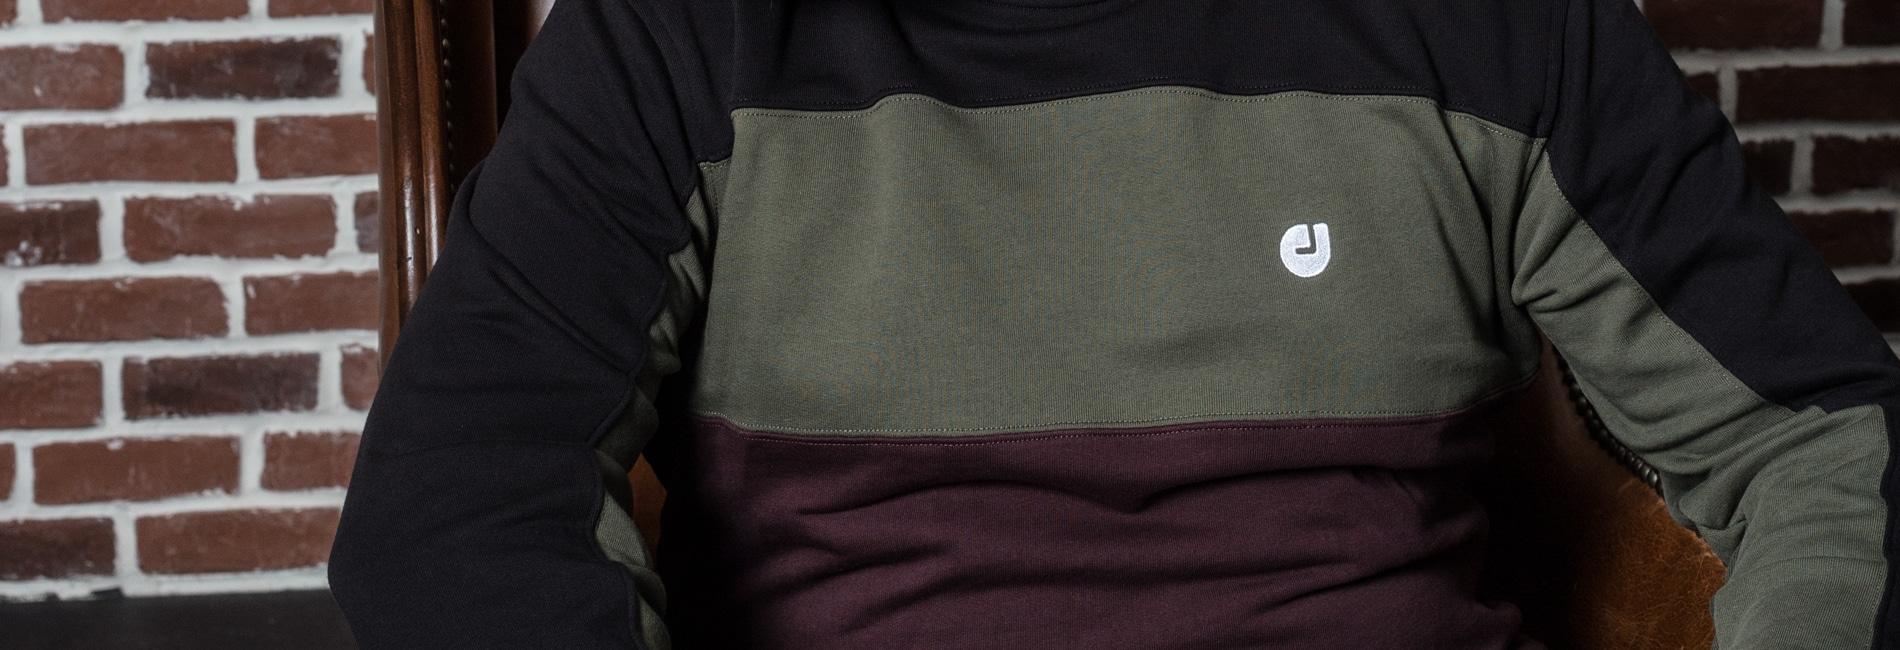 sweatshirt sarouel page nos haut dcjeans